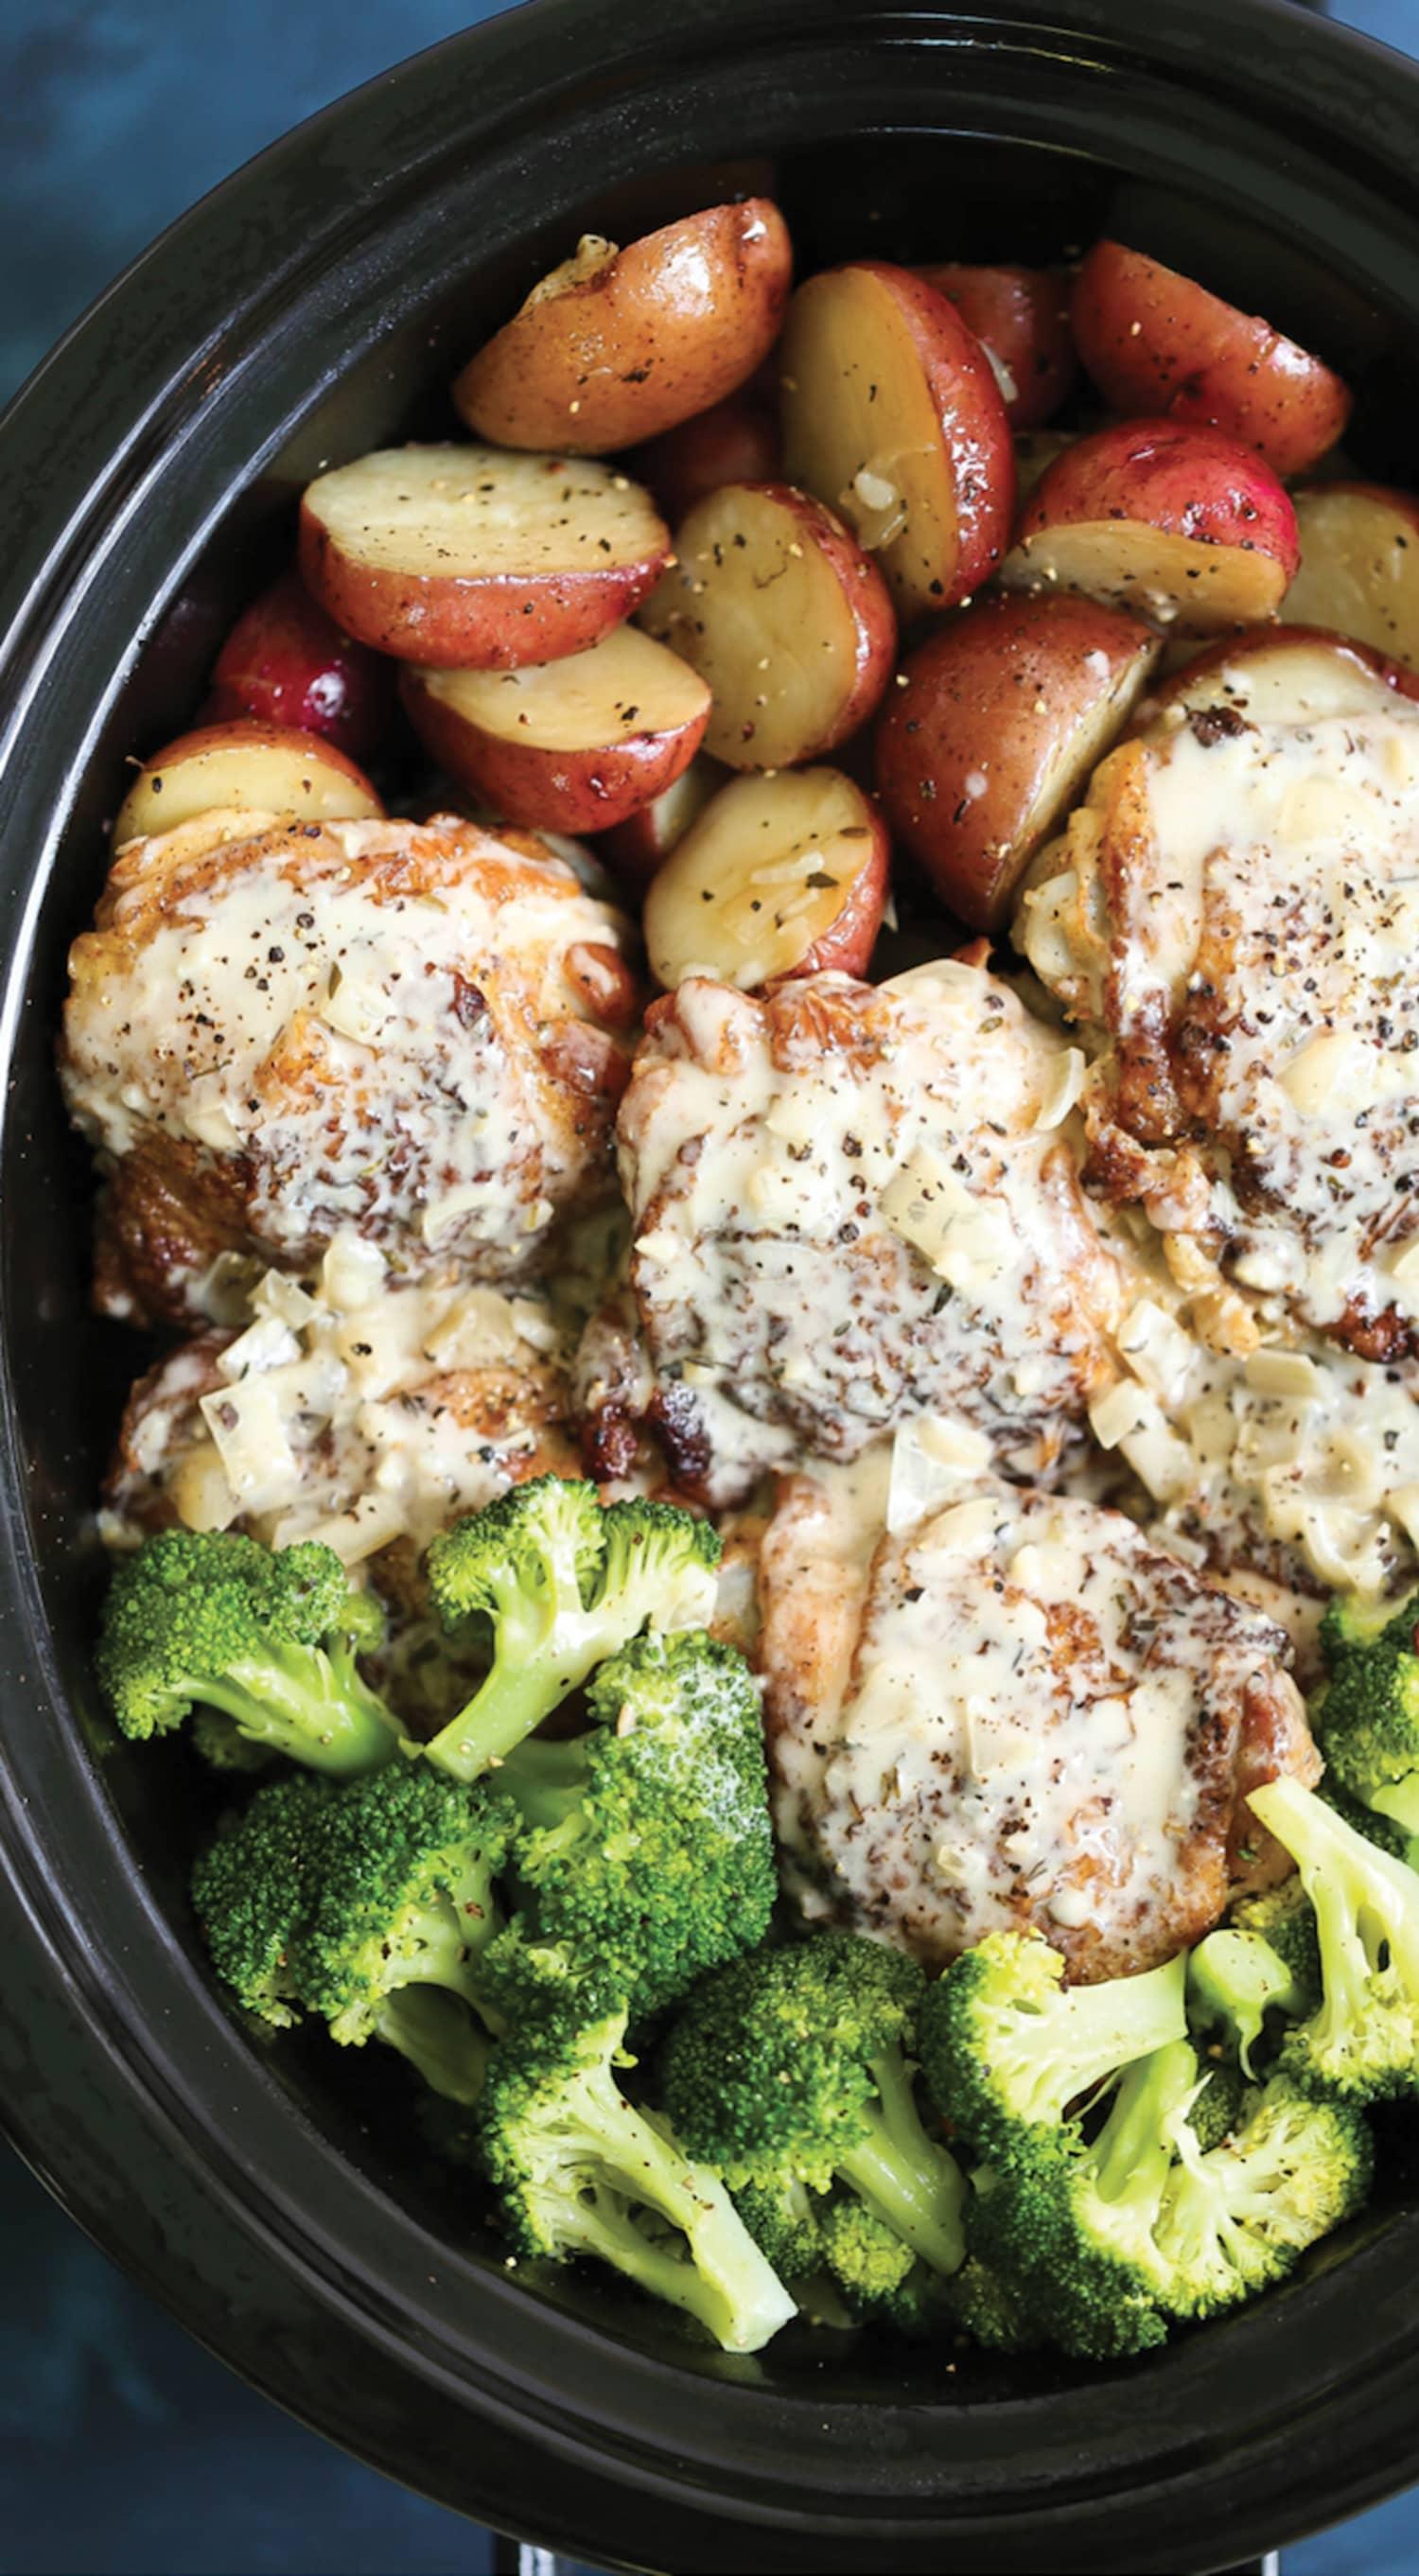 Make Creamy Garlic Chicken and Veggies in the Slow Cooker Tonight